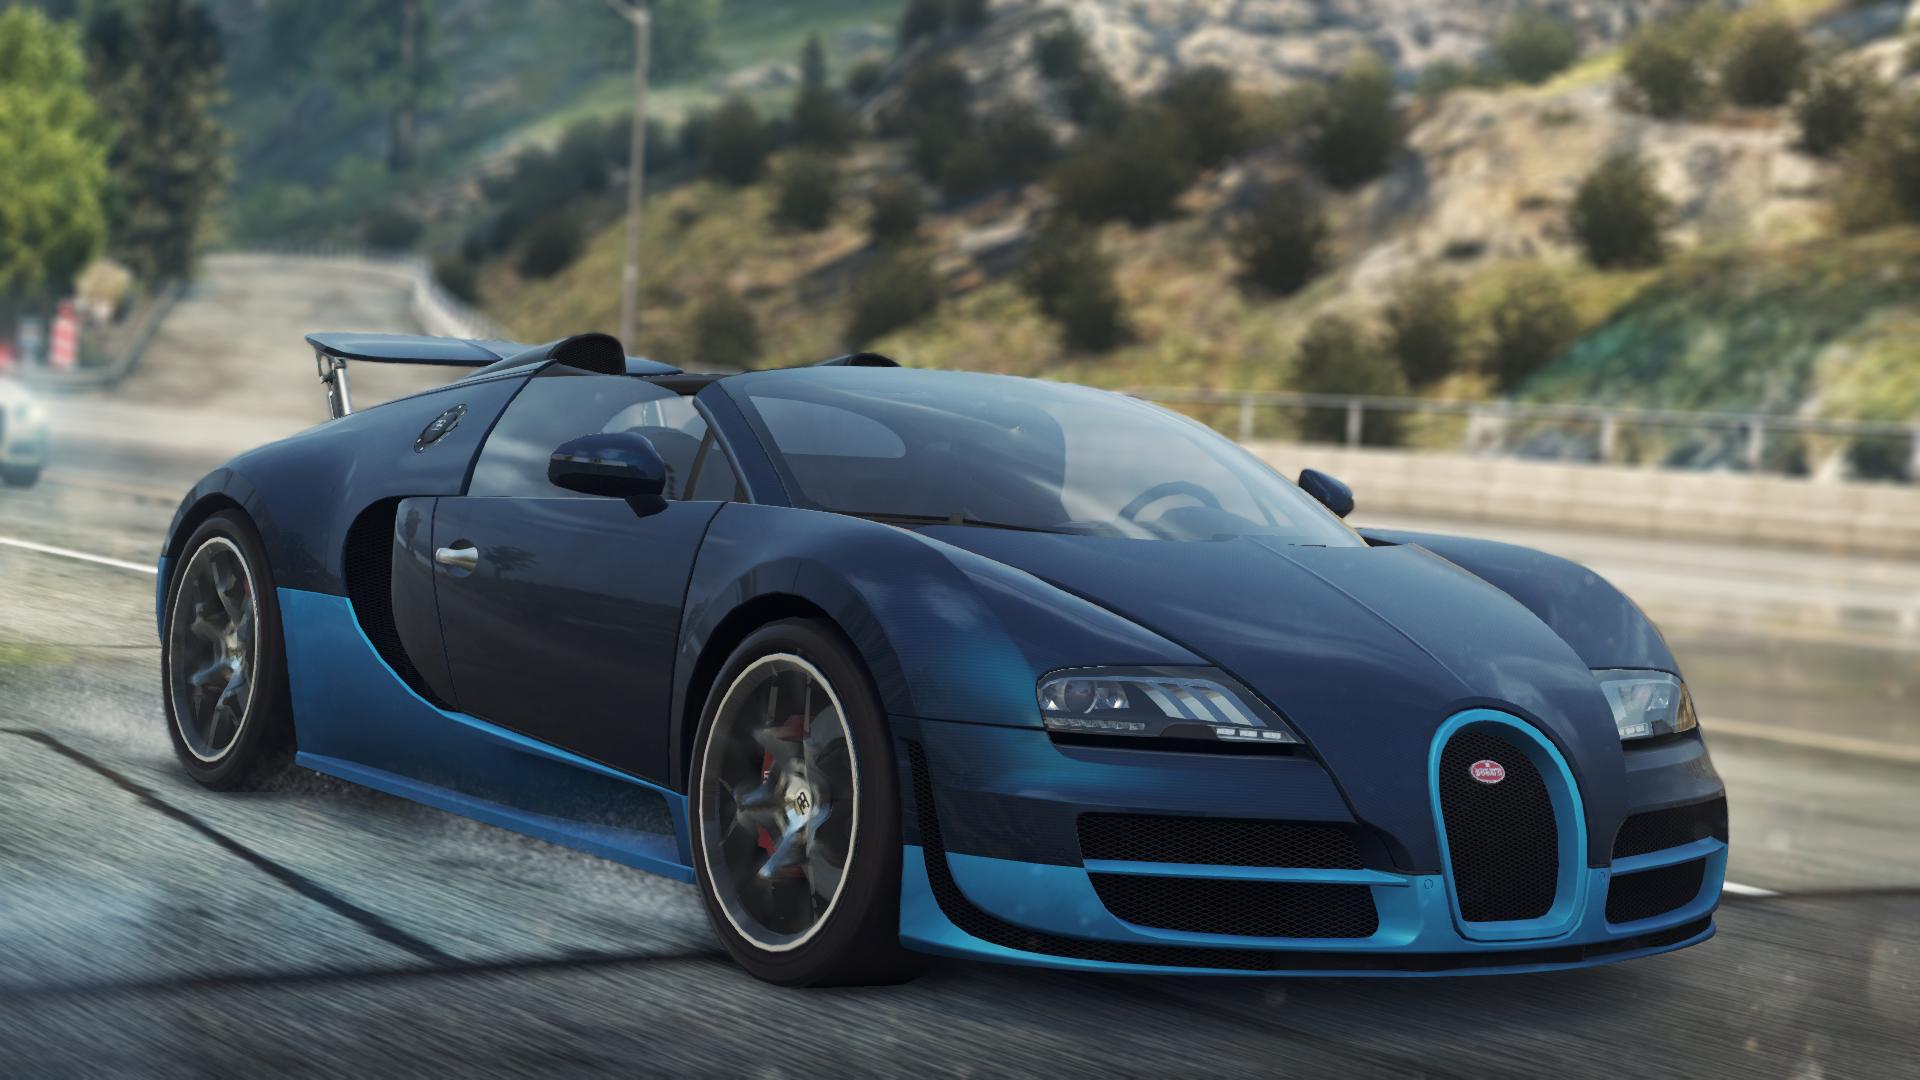 bugatti veyron grand sport vitesse by acersense on deviantart. Black Bedroom Furniture Sets. Home Design Ideas